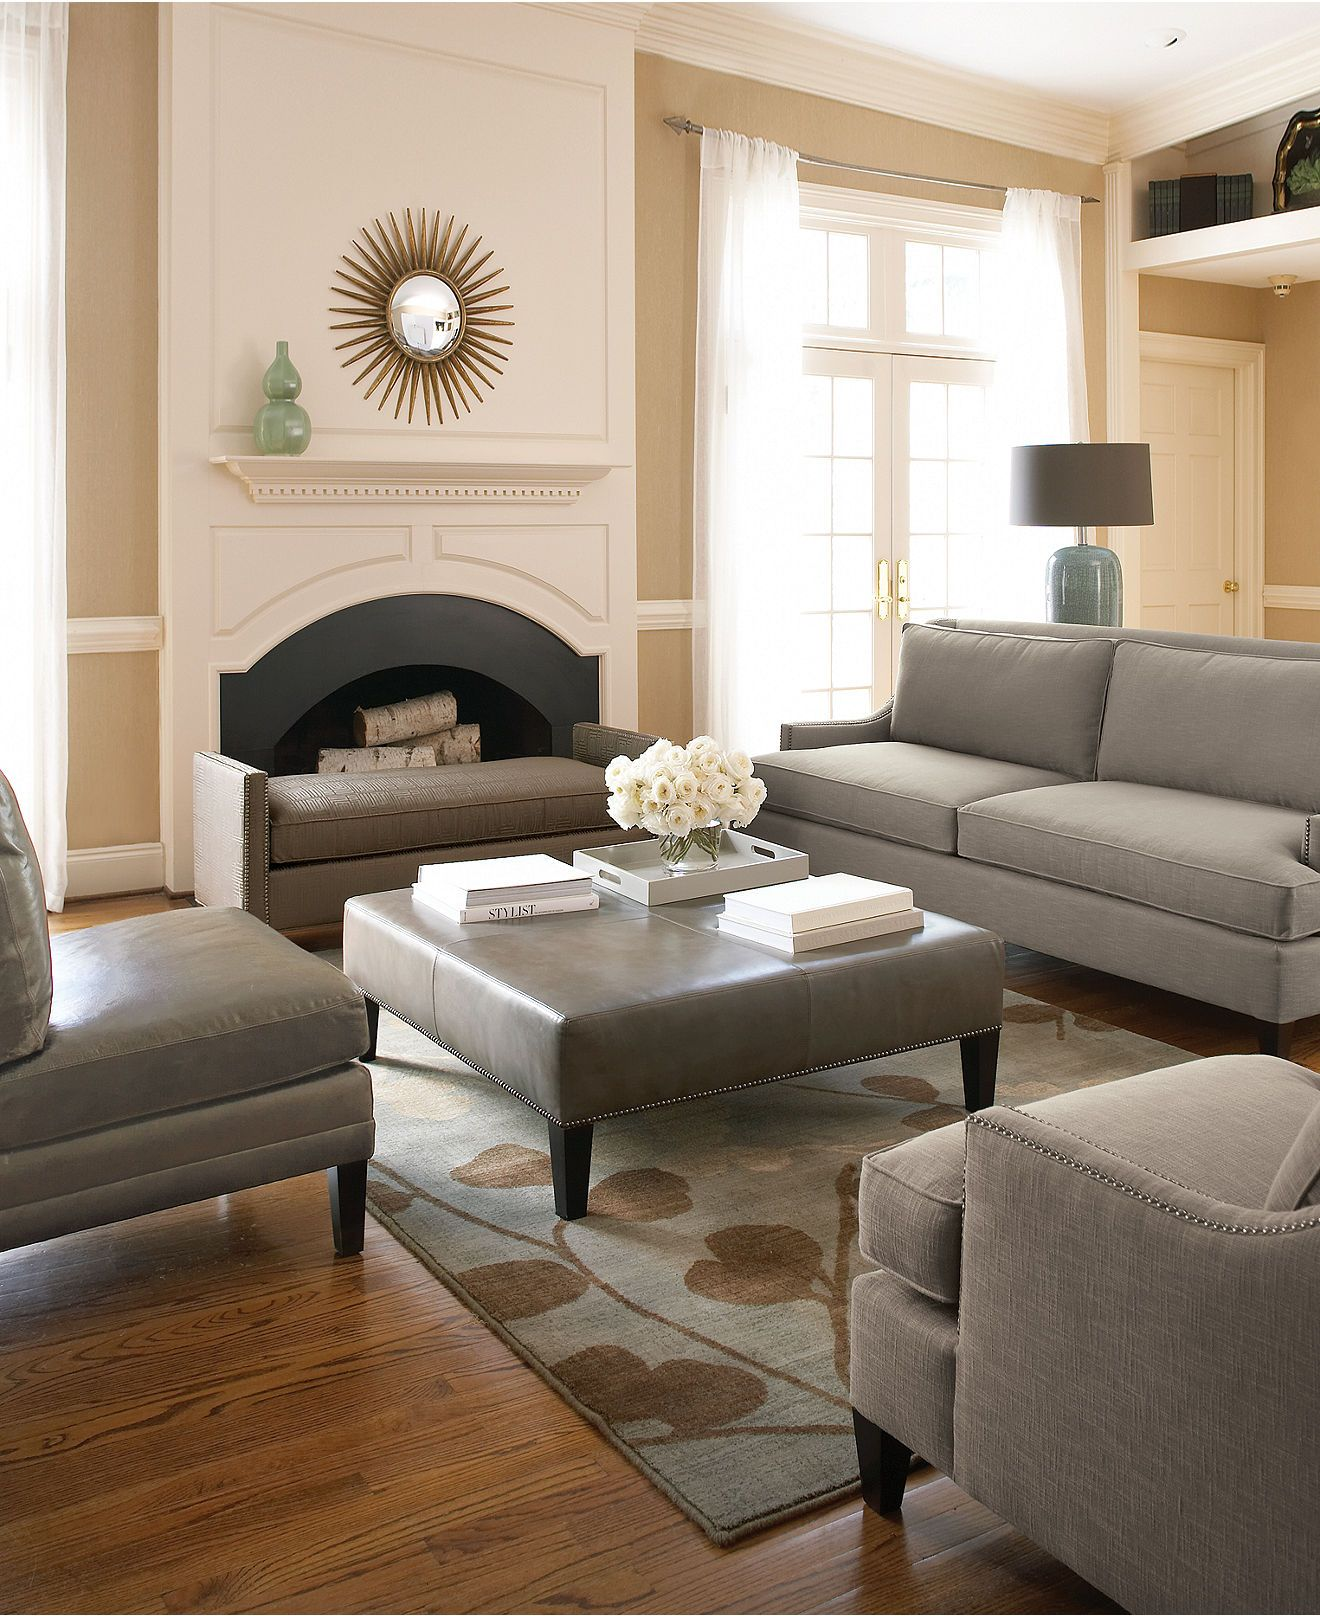 cocktail ottoman martha stewart living room furniture kent collection lifestyle pinterest. Black Bedroom Furniture Sets. Home Design Ideas